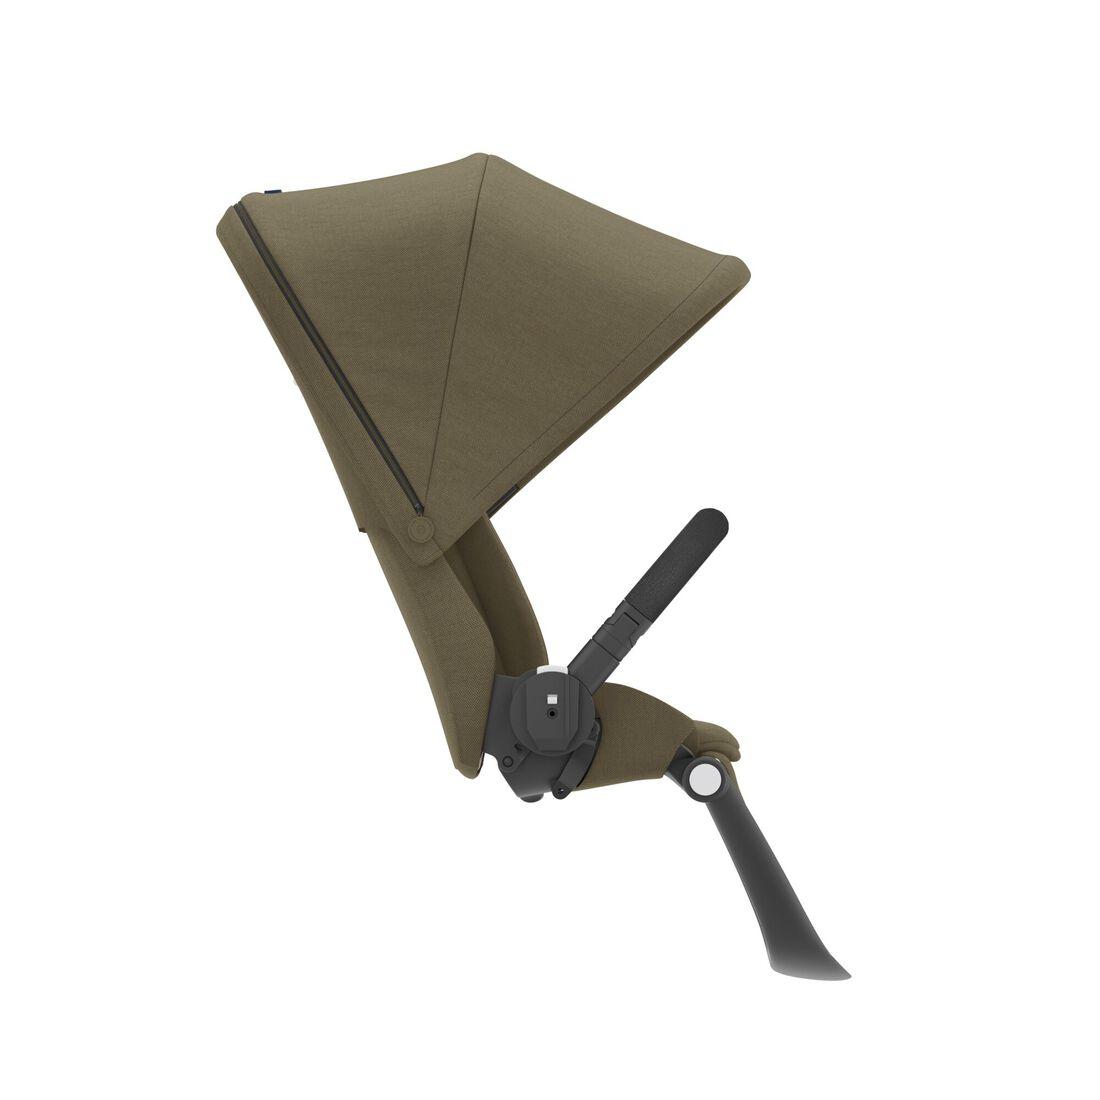 CYBEX Gazelle S Seat Unit - Classic Beige (Black Frame) in Classic Beige (Black Frame) large image number 2